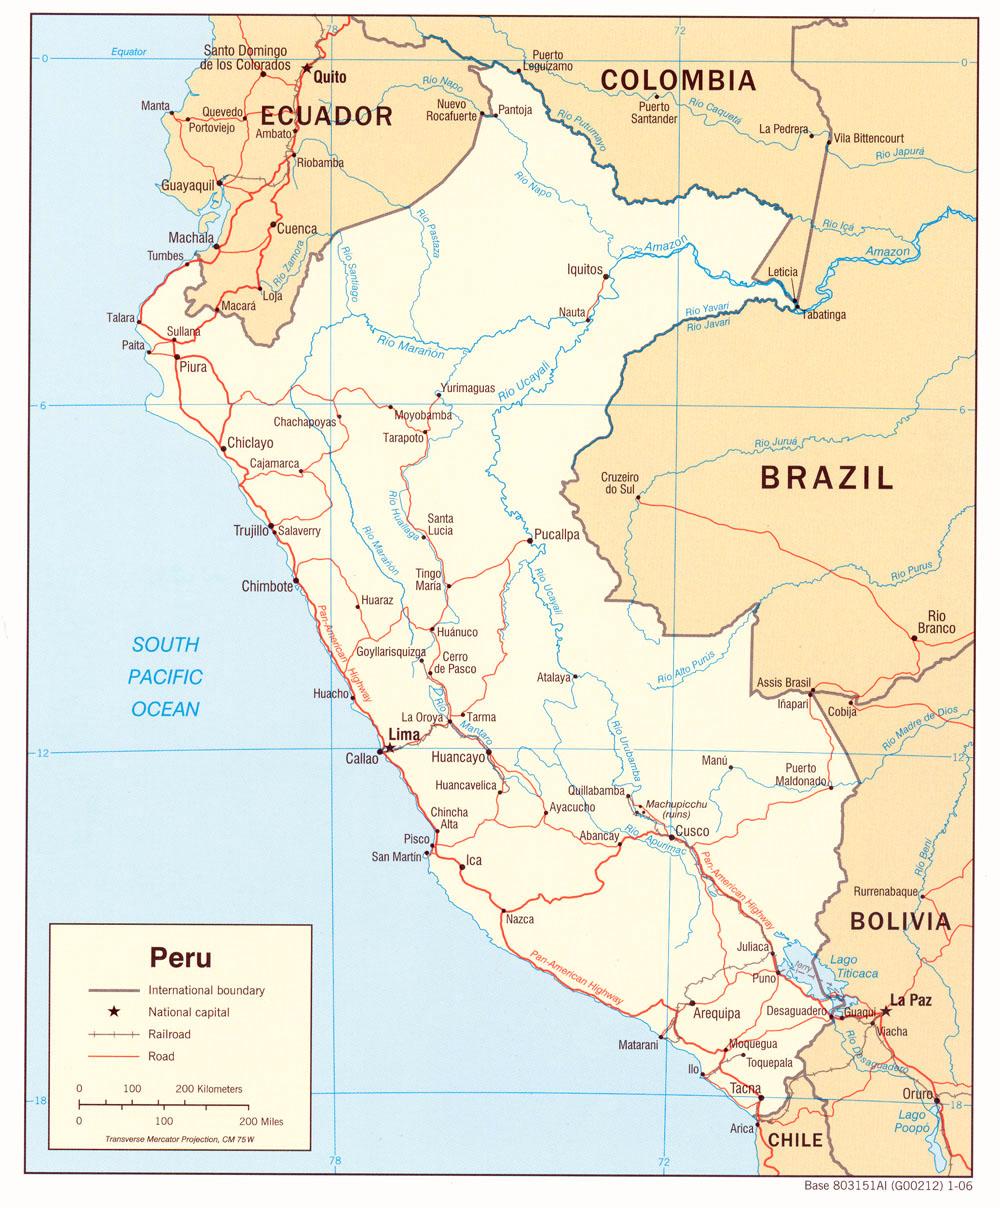 Peru Karte.Landkarte Peru Landkarten Download Perukarte Peru Landkarte